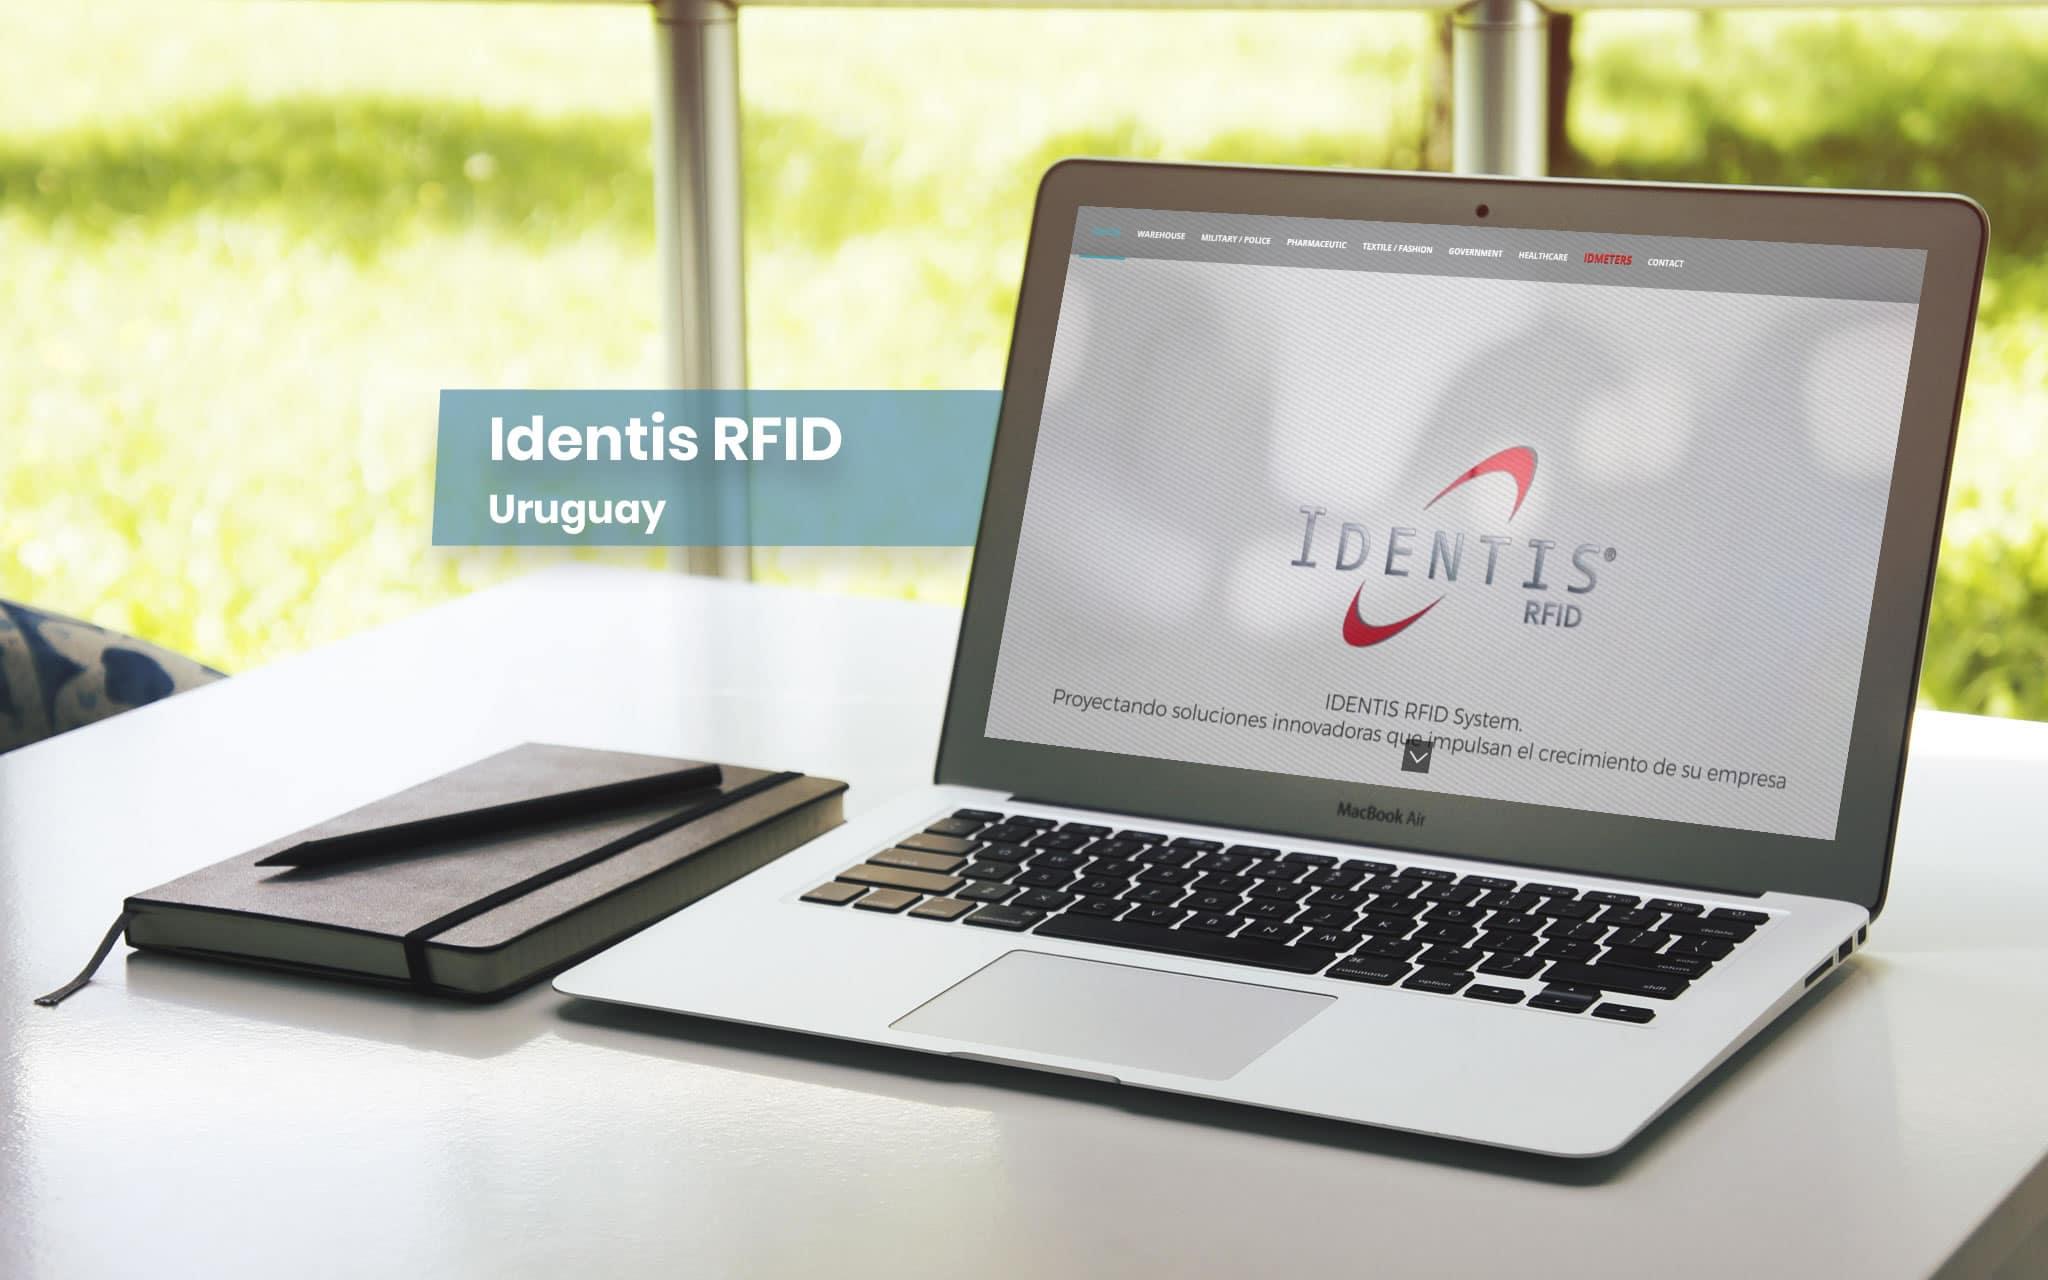 Identis RFID - Uruguay